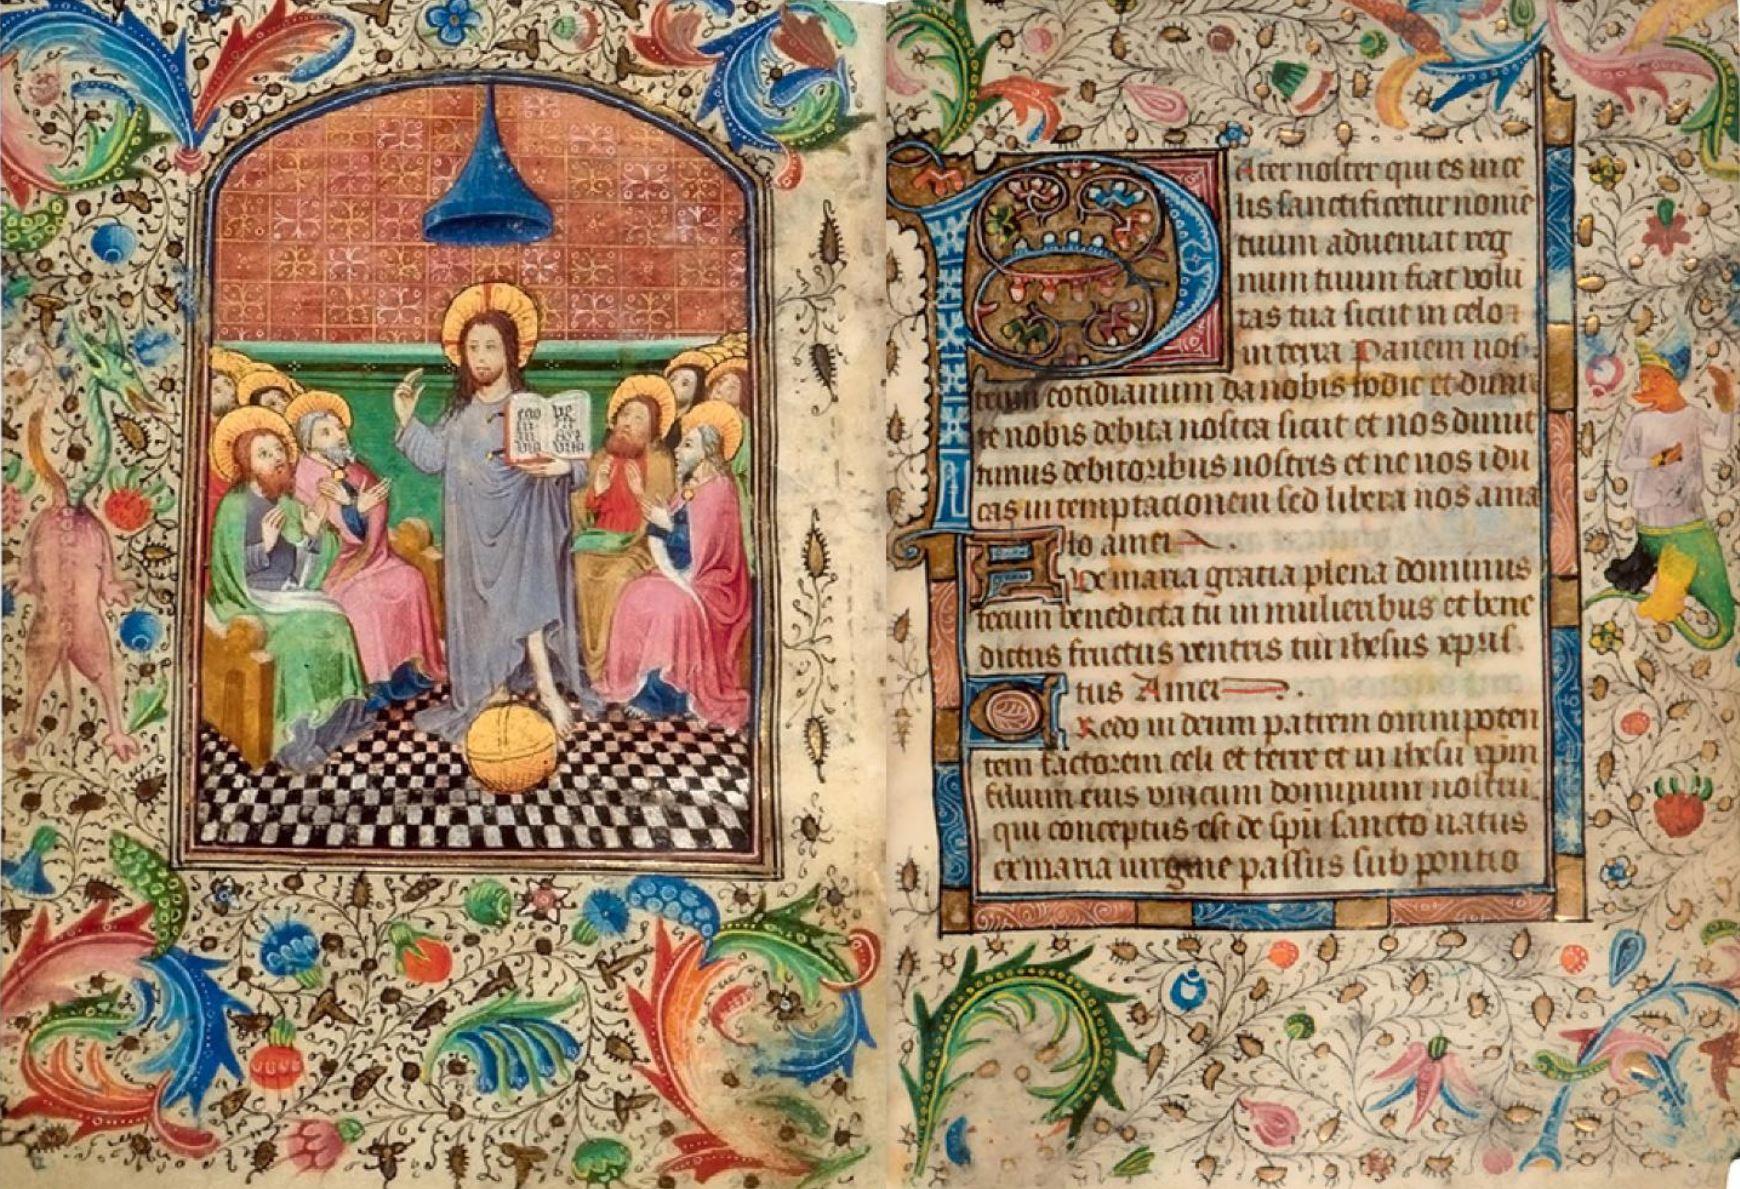 Master of the Golds Scrolls 1445 ca Bruges Jesus enseignant la priere a ses disciples BL Add MS 39638 fol 35v